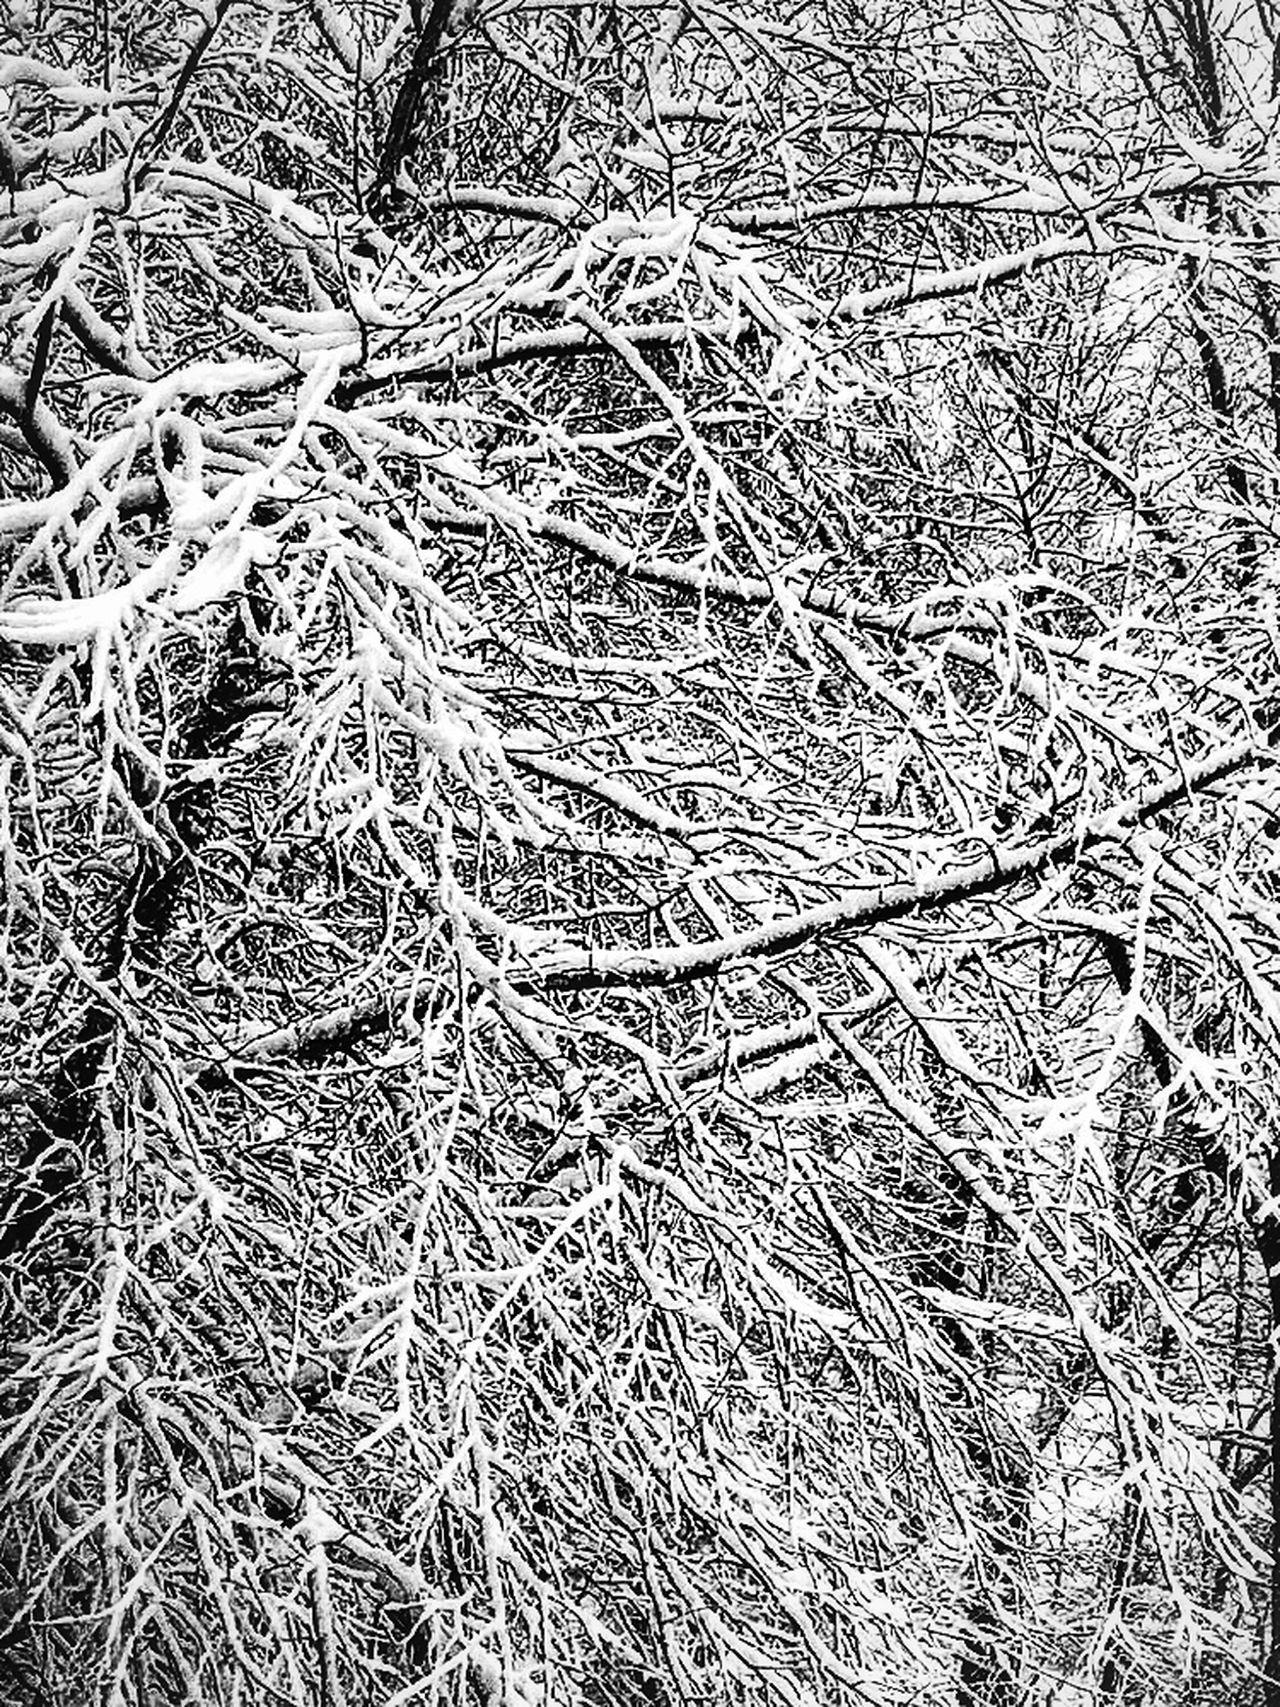 ❄️Tree❄️ Snow Winter Newengland Frozen Nature Not Cartoon Showcase: February